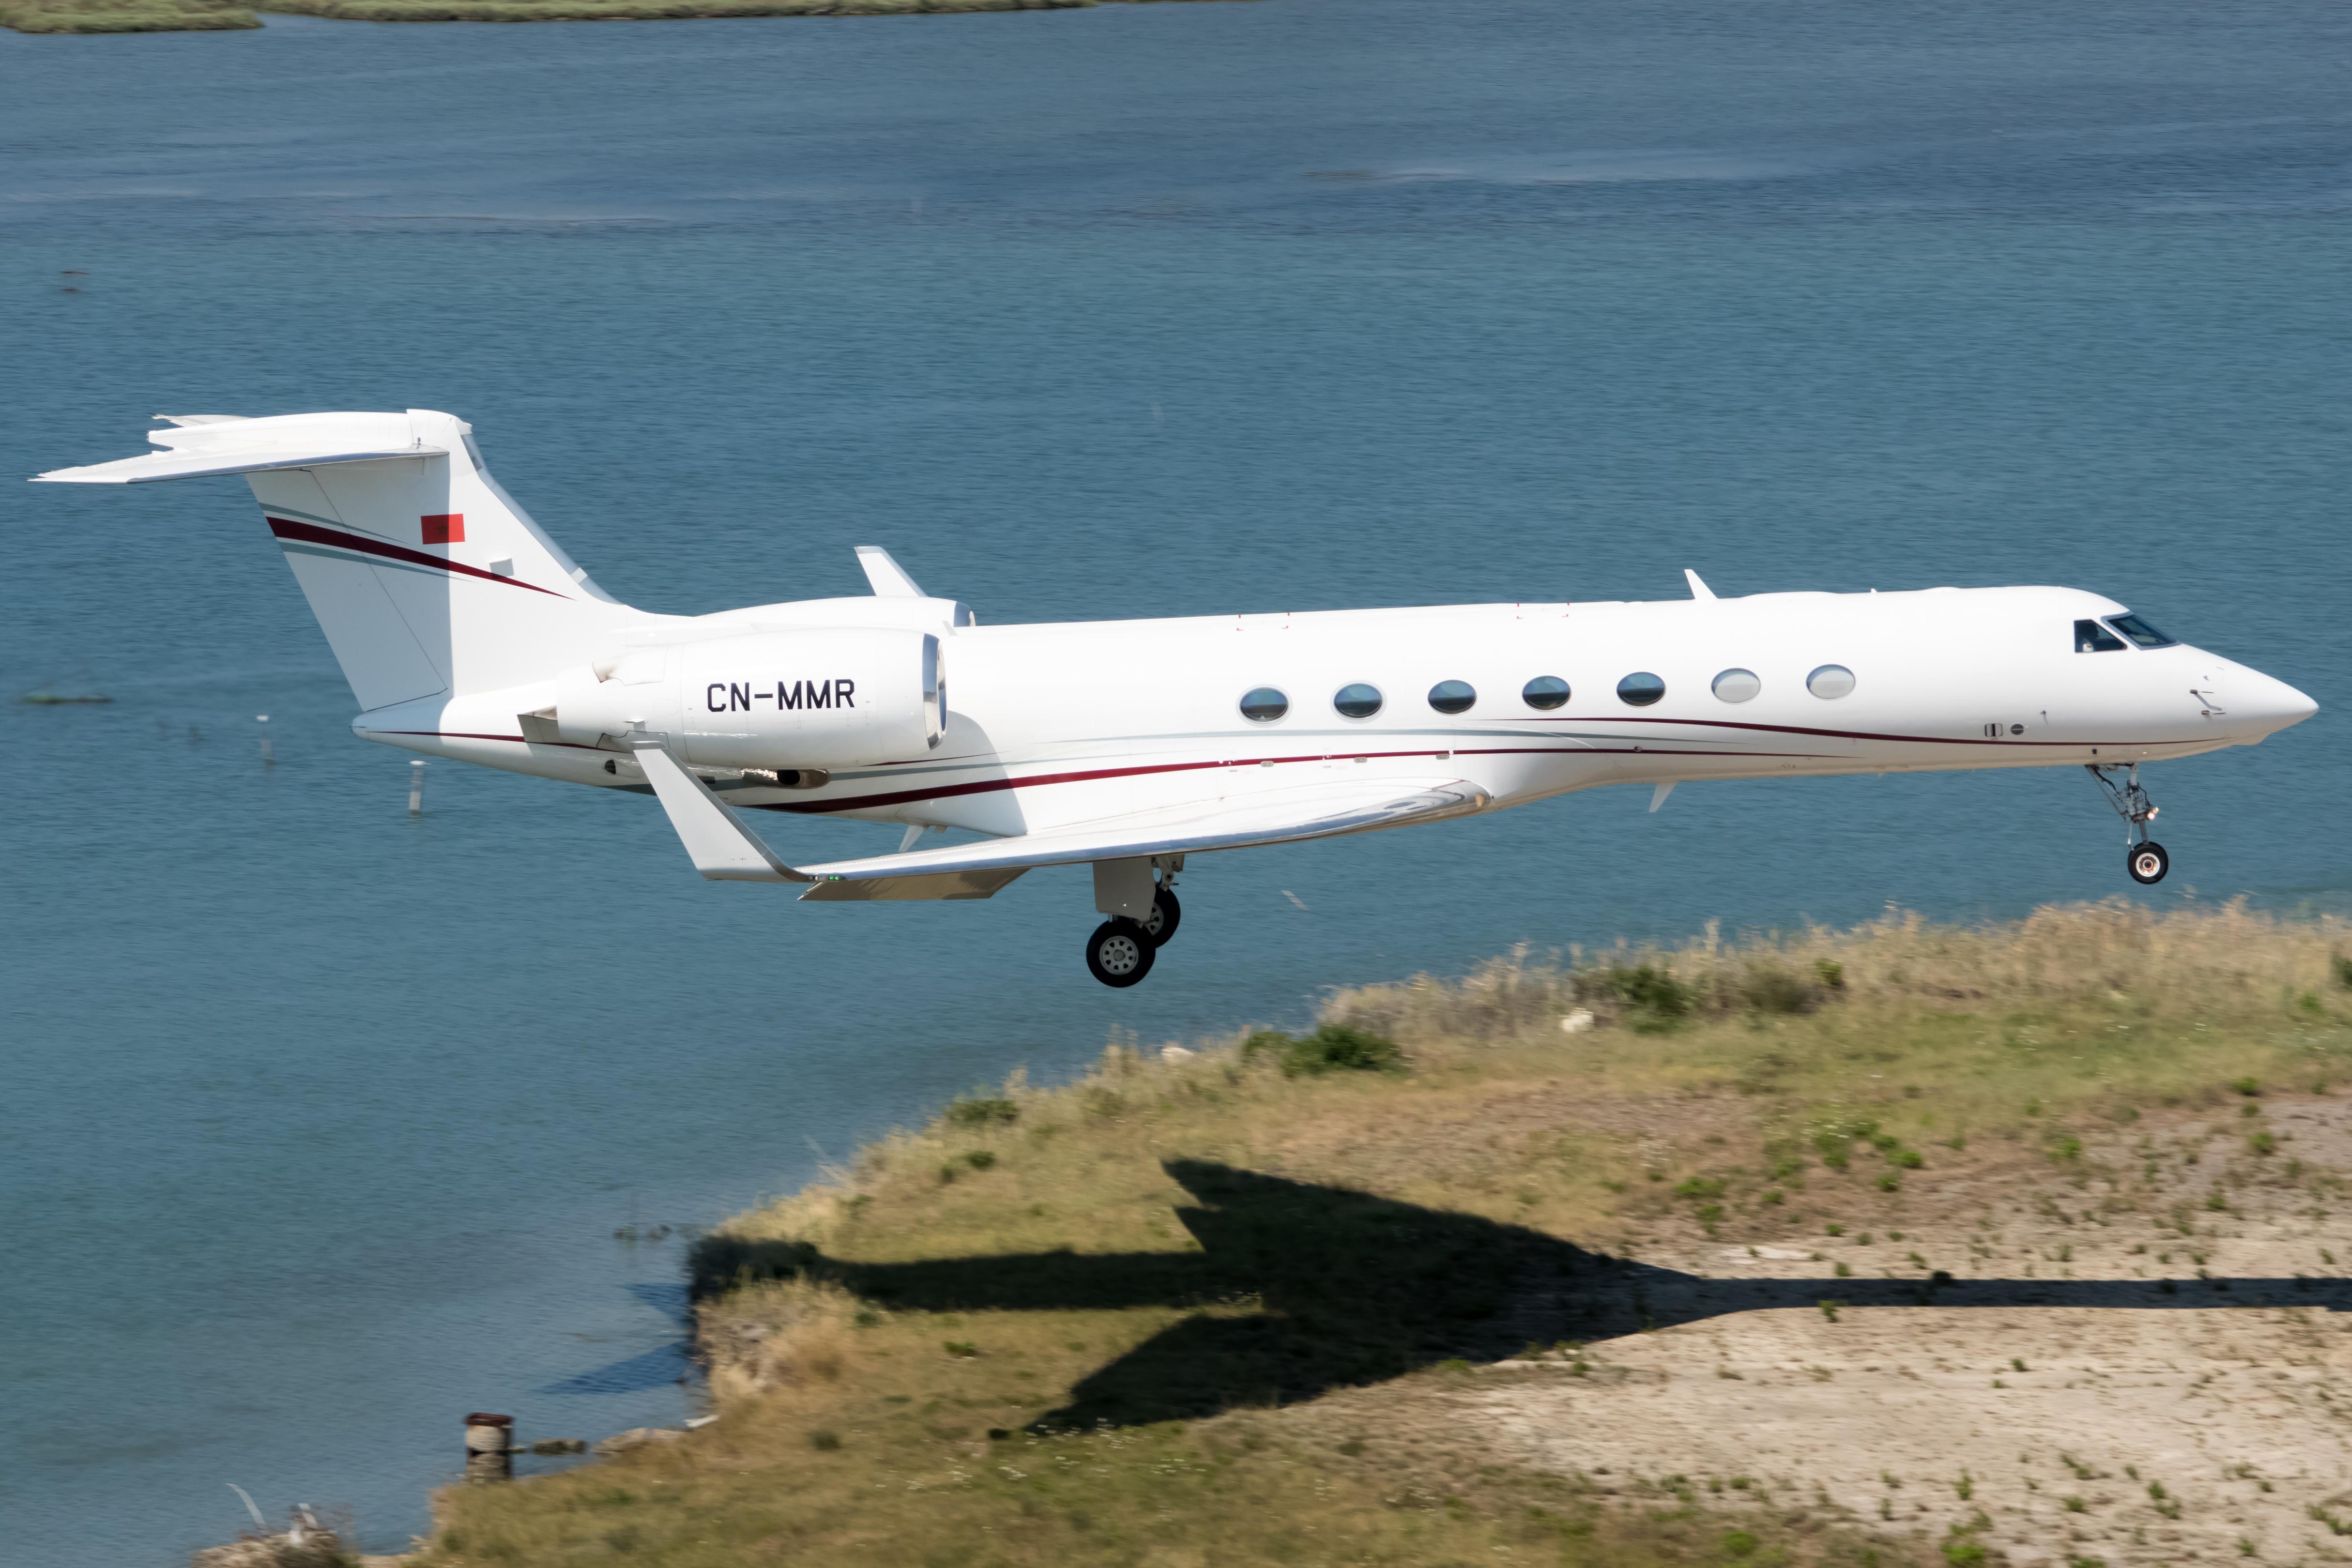 FRA: Avions VIP, Liaison & ECM - Page 23 48432919166_4484f8b56c_o